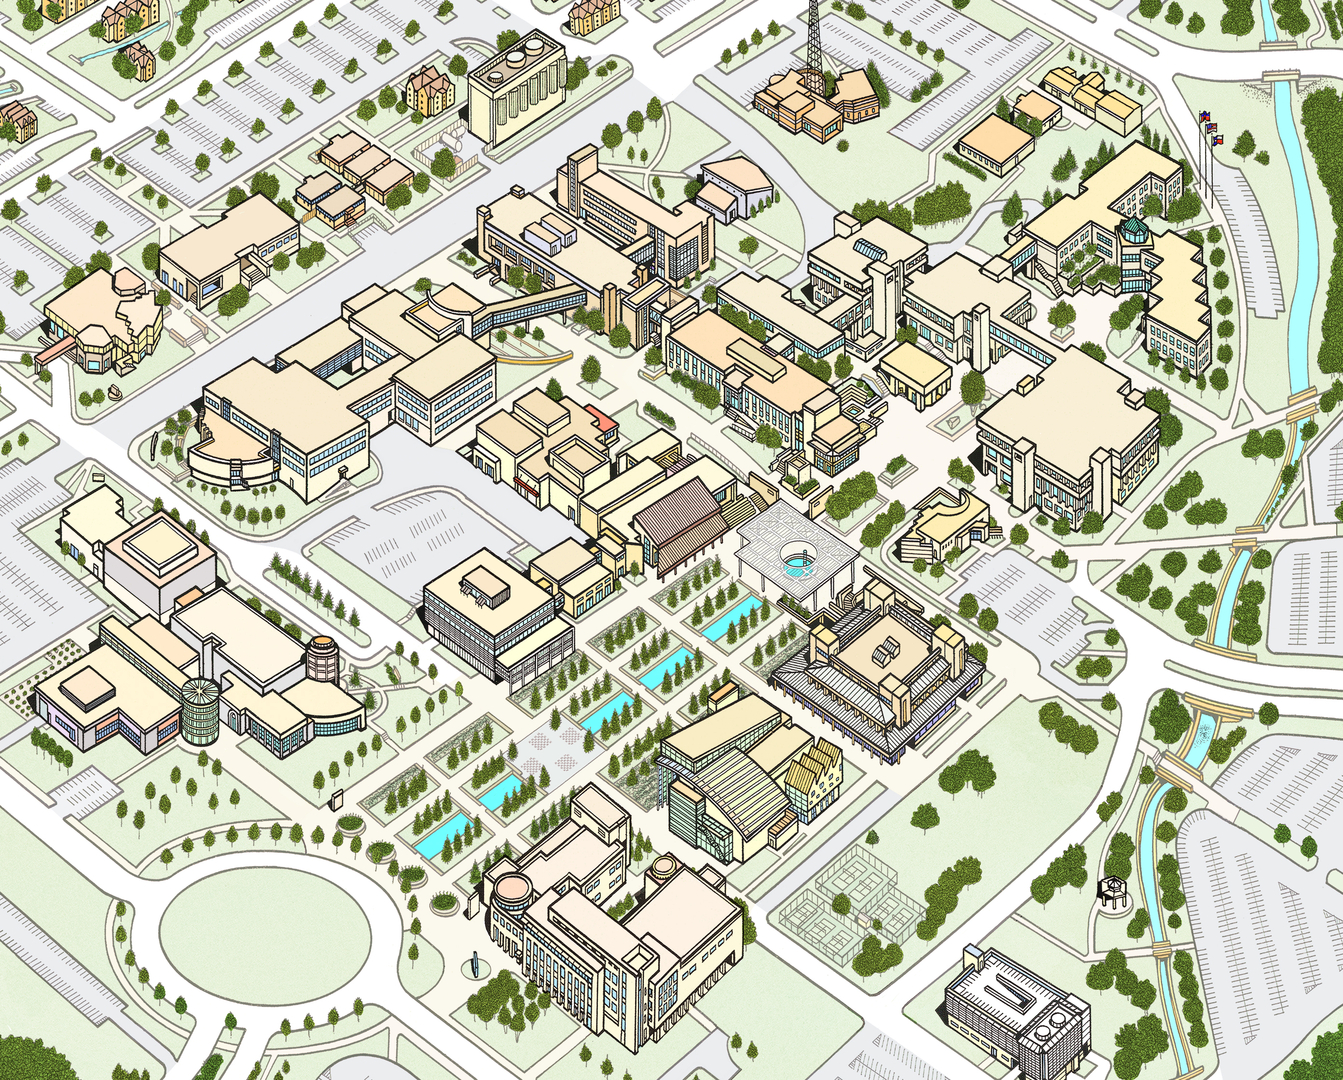 Baker College Flint Campus Map.Campus Maps